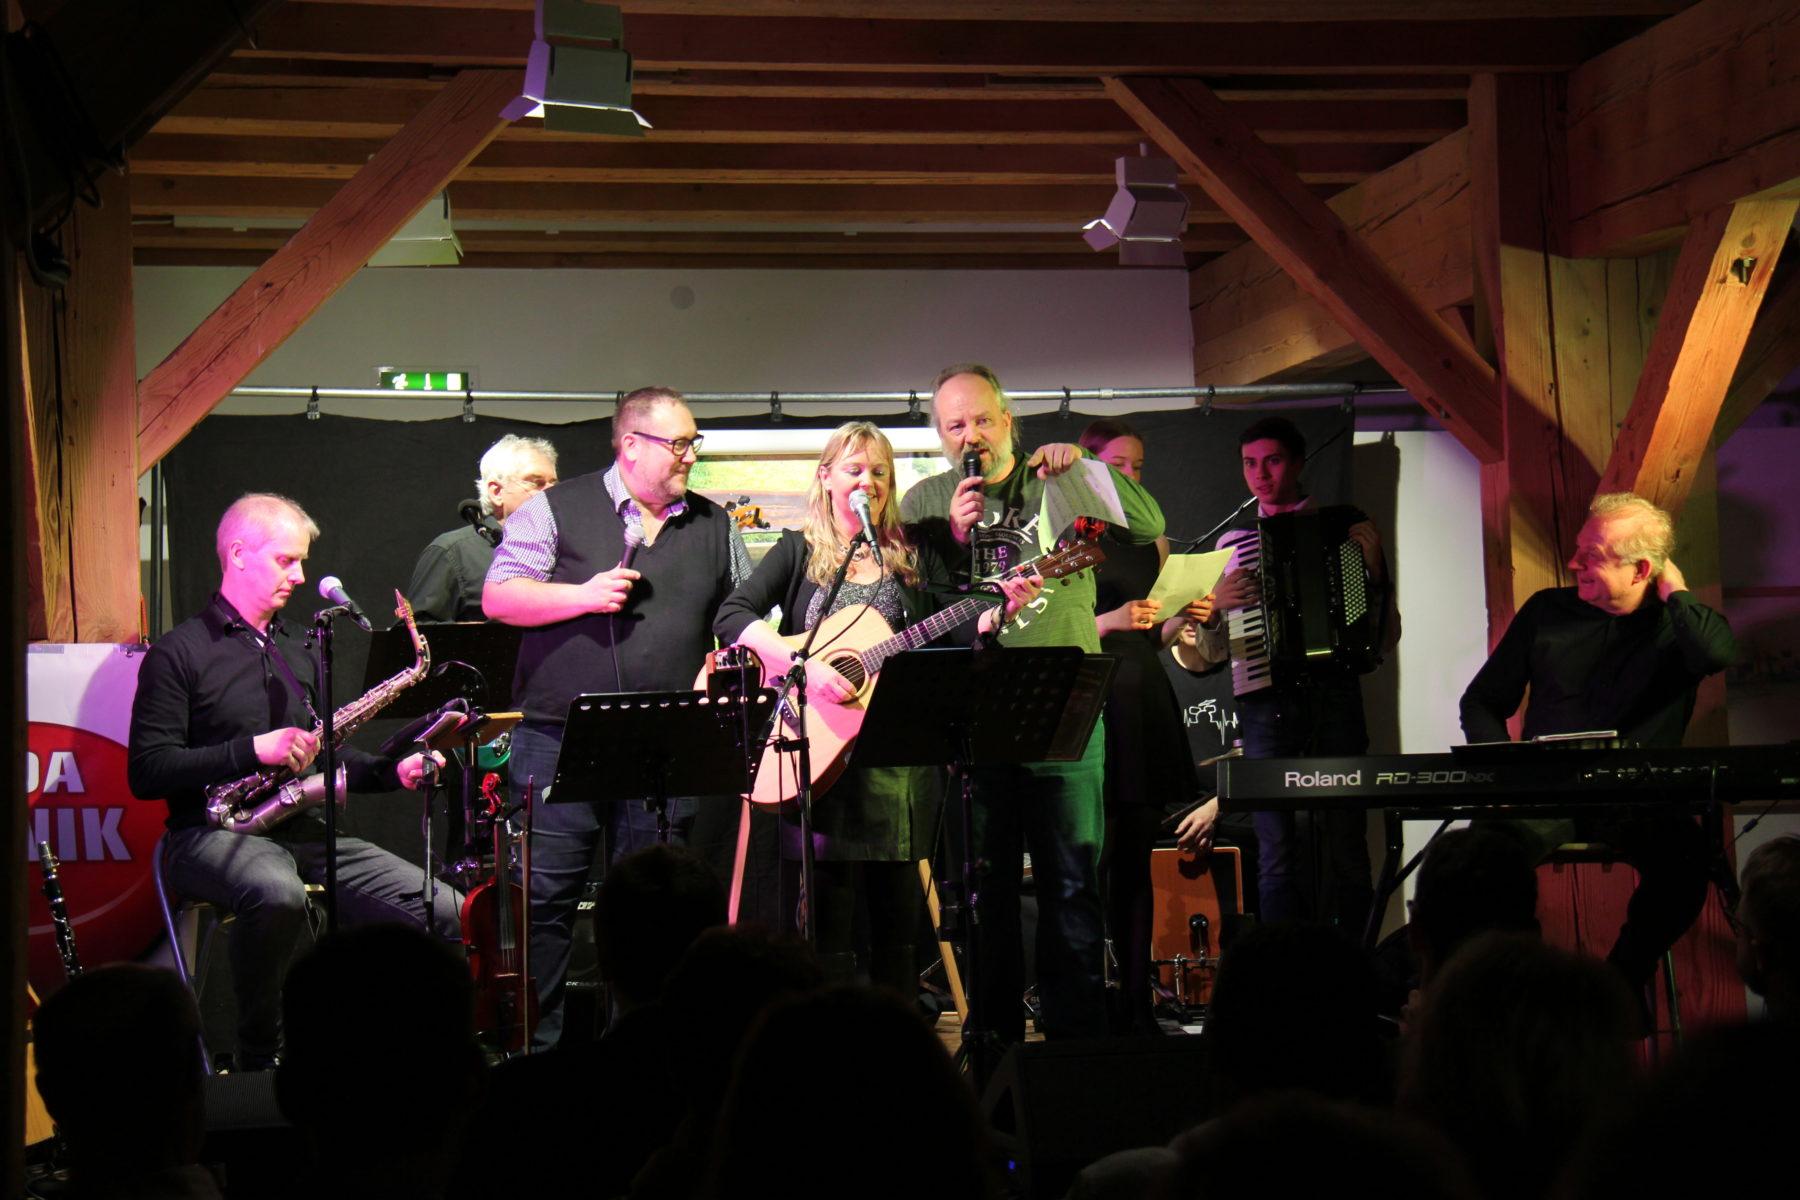 PfarrkirchenLied-DoBinIEinfachDahoam-WoifeChristlMrJonesKoaPANikBand-CD-Release-PAN-Live-08.03.2020